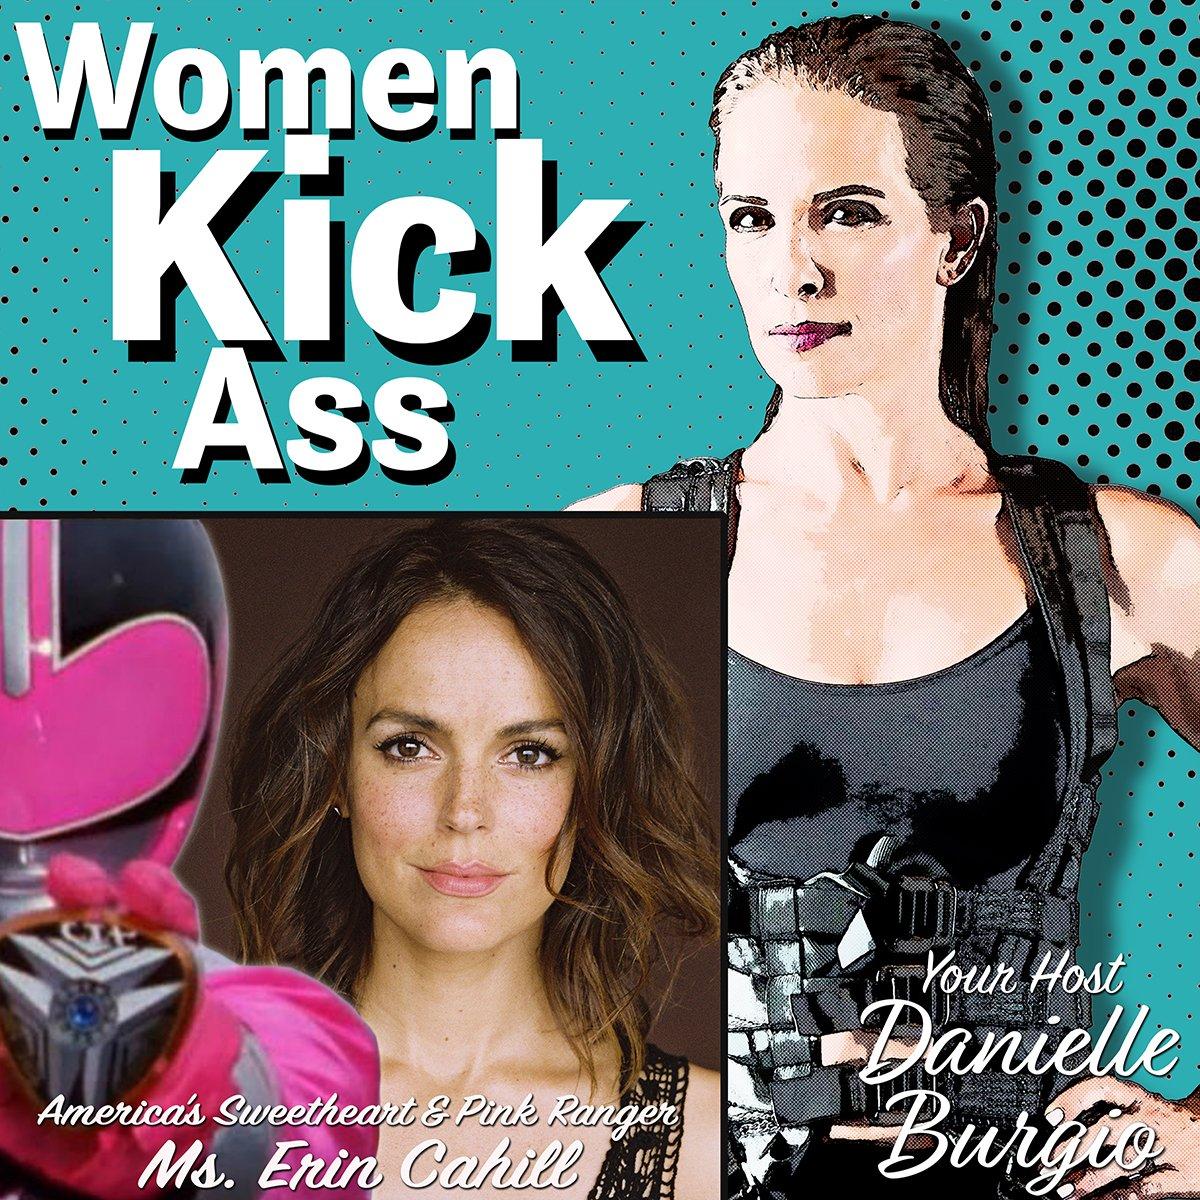 Buckle UP! UR in 4 a ride as @DaniBurgio1111 speaks with #AmericasSweetheart & original #PinkRanger #PowerRanger @theErinCahill on the #WomenKickAss Podcast about career, feminine & powerful,  so MUCH more: https://directory.libsyn.com/episode/index/id/13096844…  #WomenInFilm #WomenInspiringWomen #BadASSWomenpic.twitter.com/78YXjdB8f1